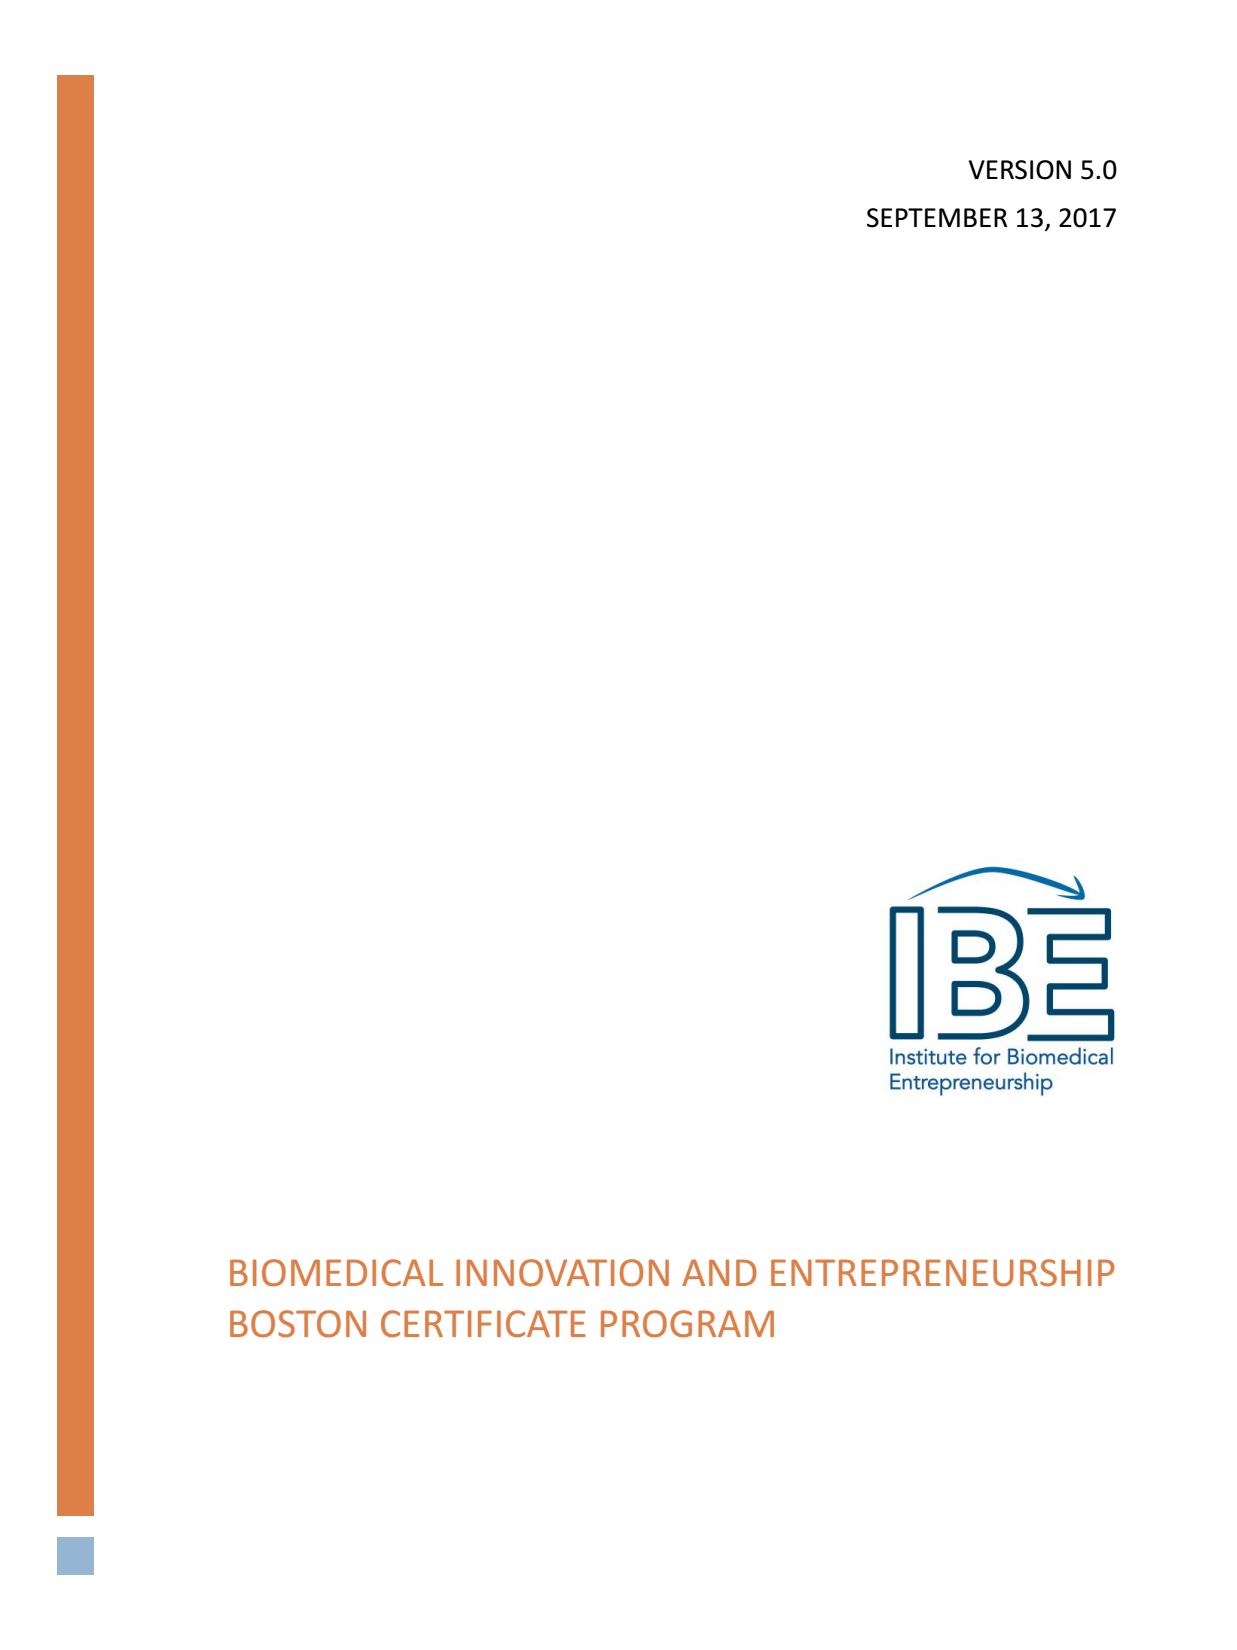 Ibe boston course information.pdfpjqkbg6phhj1eavjaejg